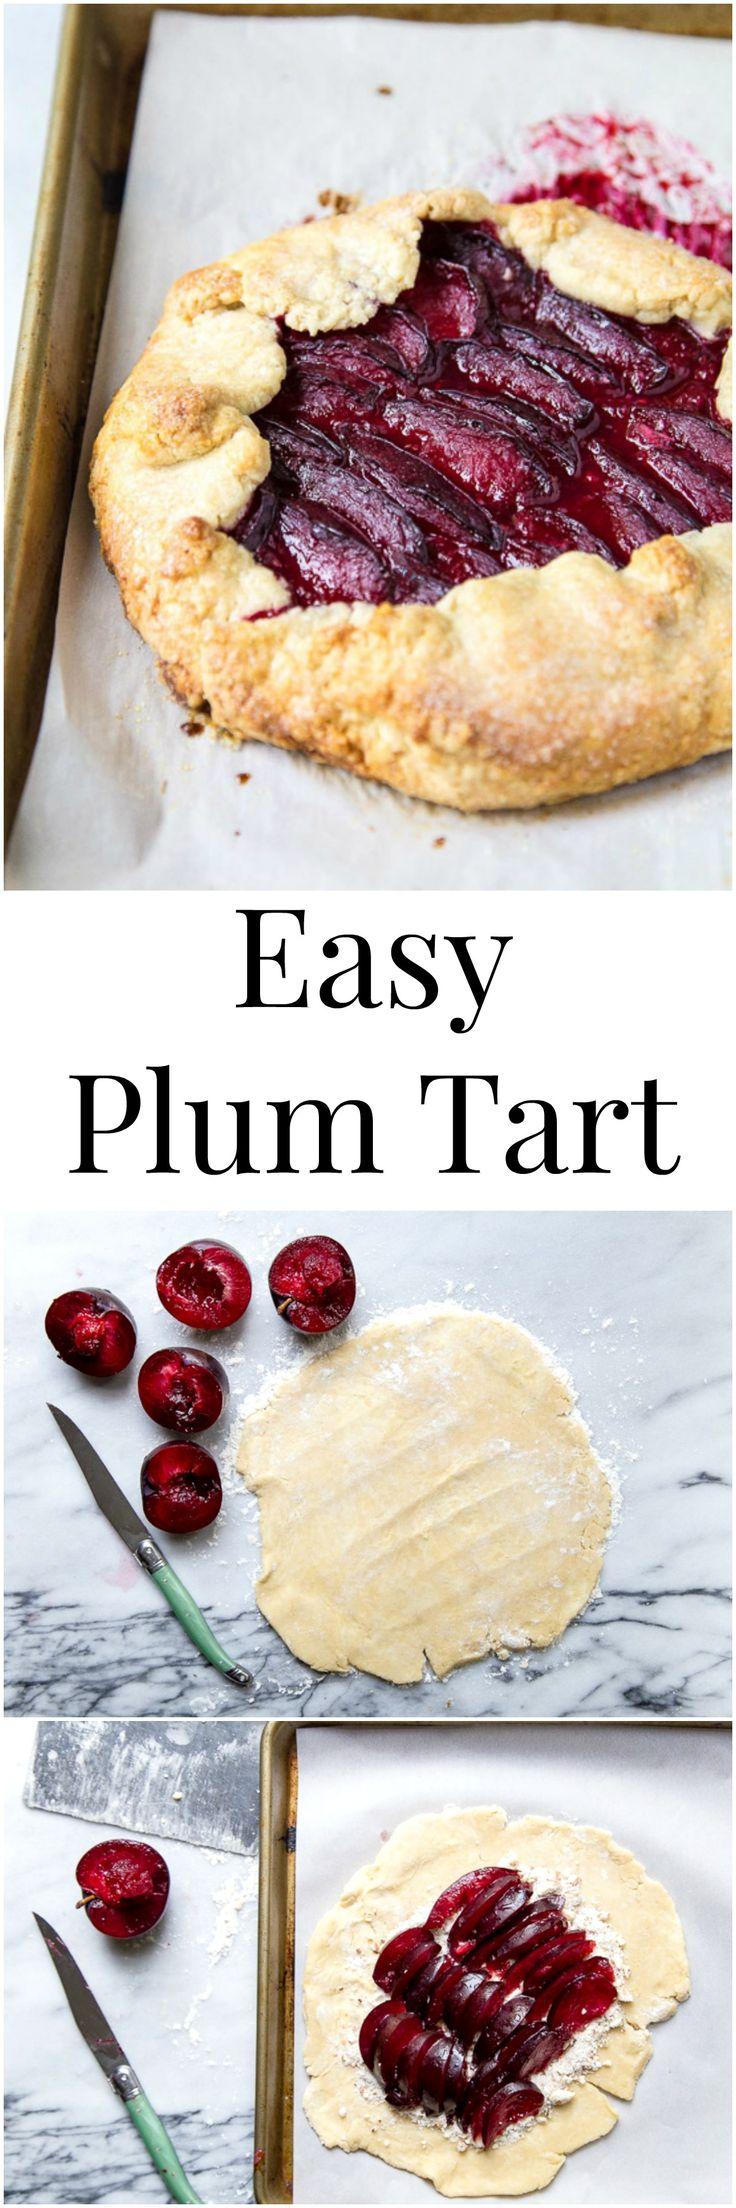 Plum galette recipe using summer stone fruit. I halved Martha Stewart's recipe to make a mini fruit tart, and loved it!